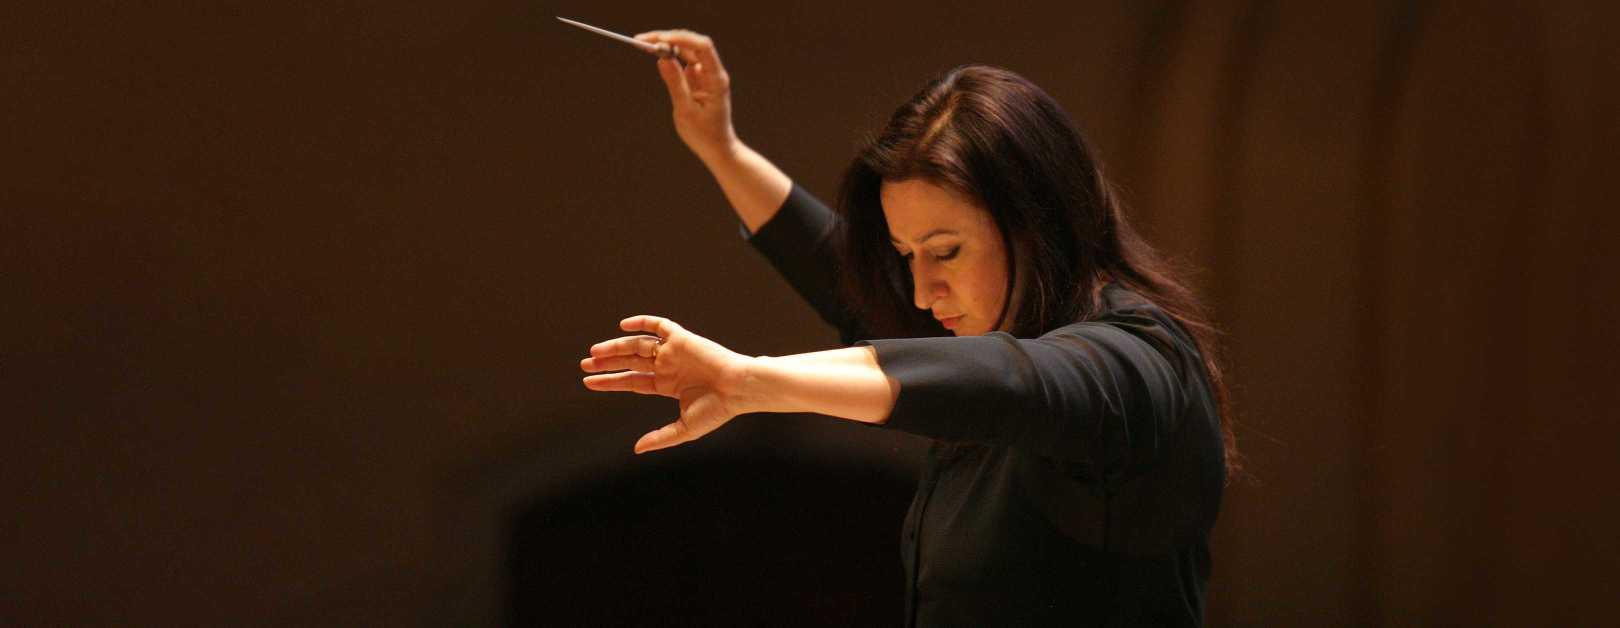 Mahler's Symphony No. 6